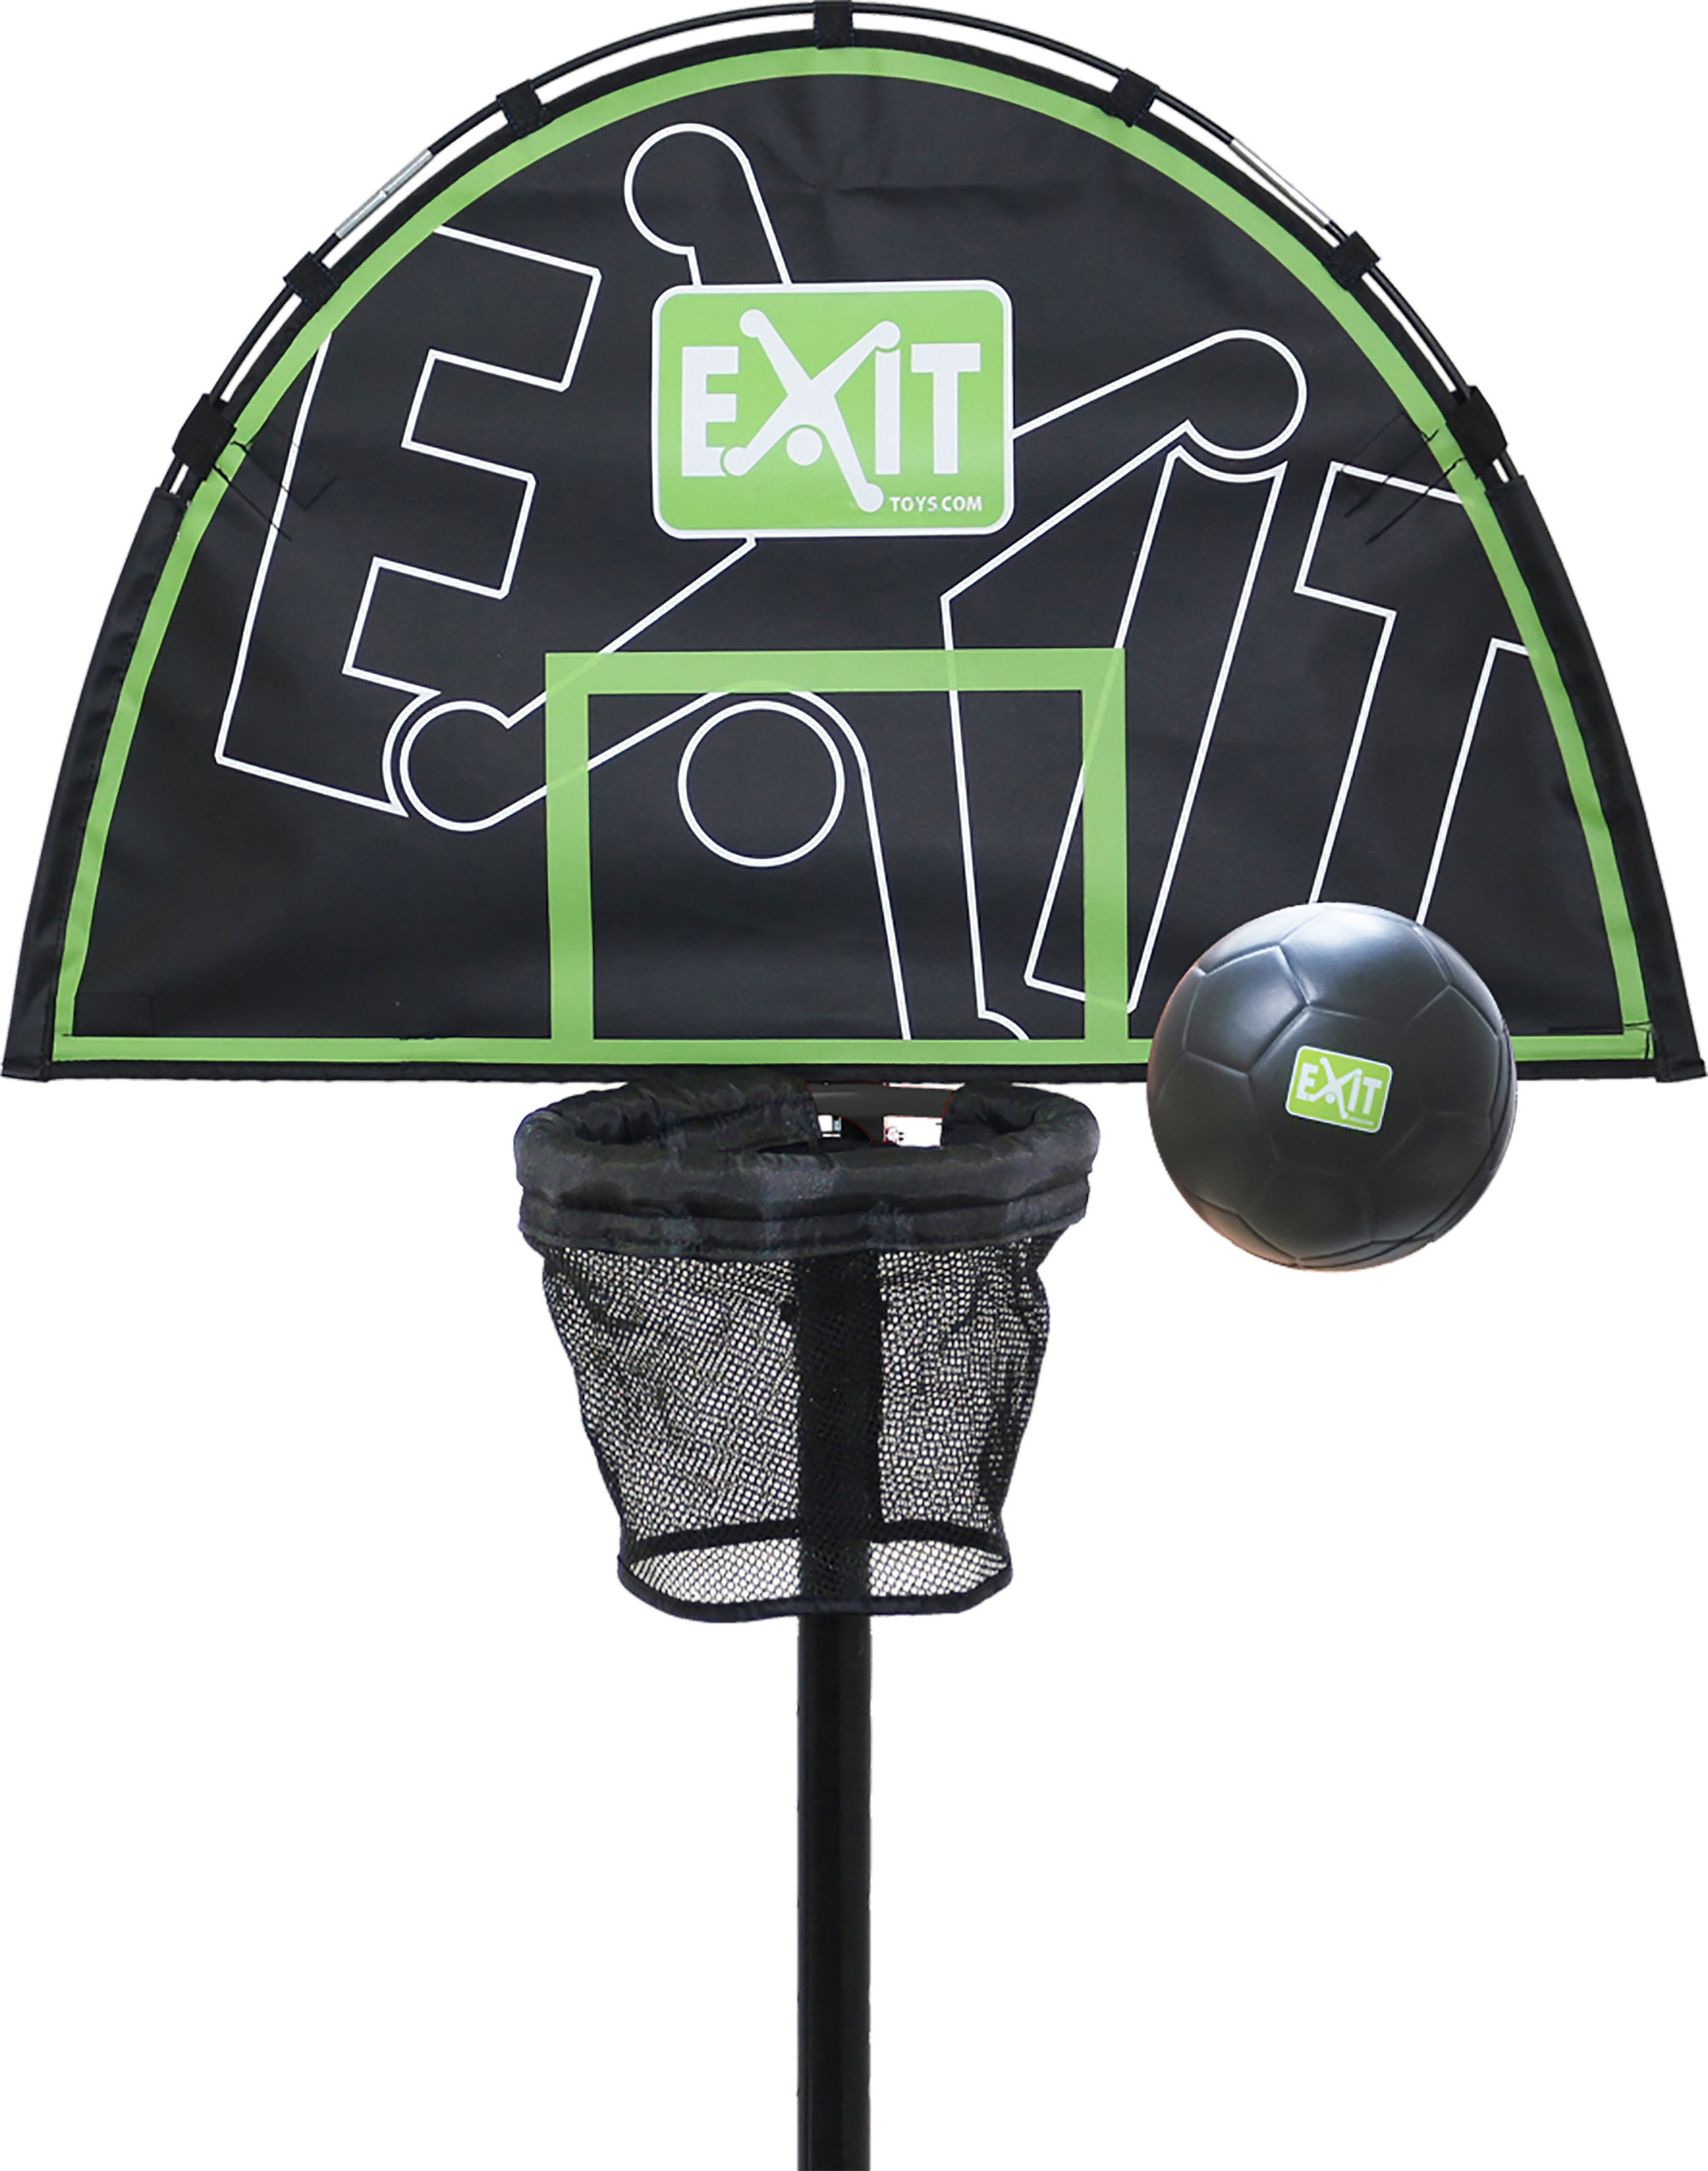 EXIT Basketballkorb für Trampolin + Mini Schaumball Ø15cm Bild 1